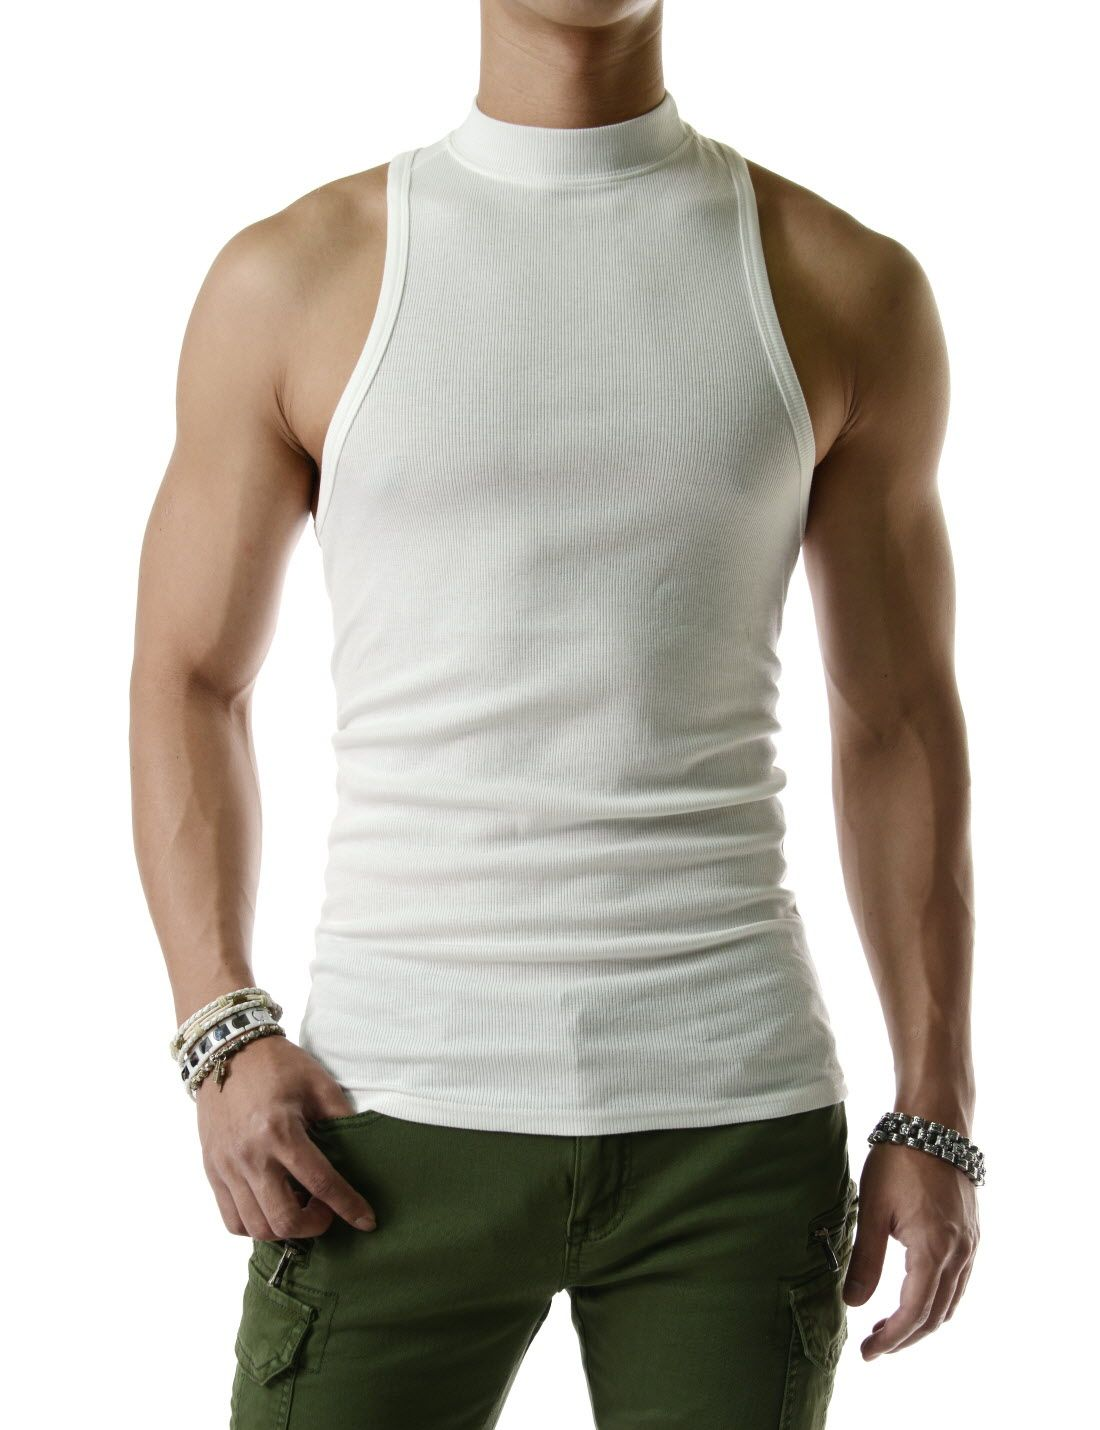 3e15b9dbdfa70 High Neck Tank Top 100% Cotton Sleeveless Tshirts